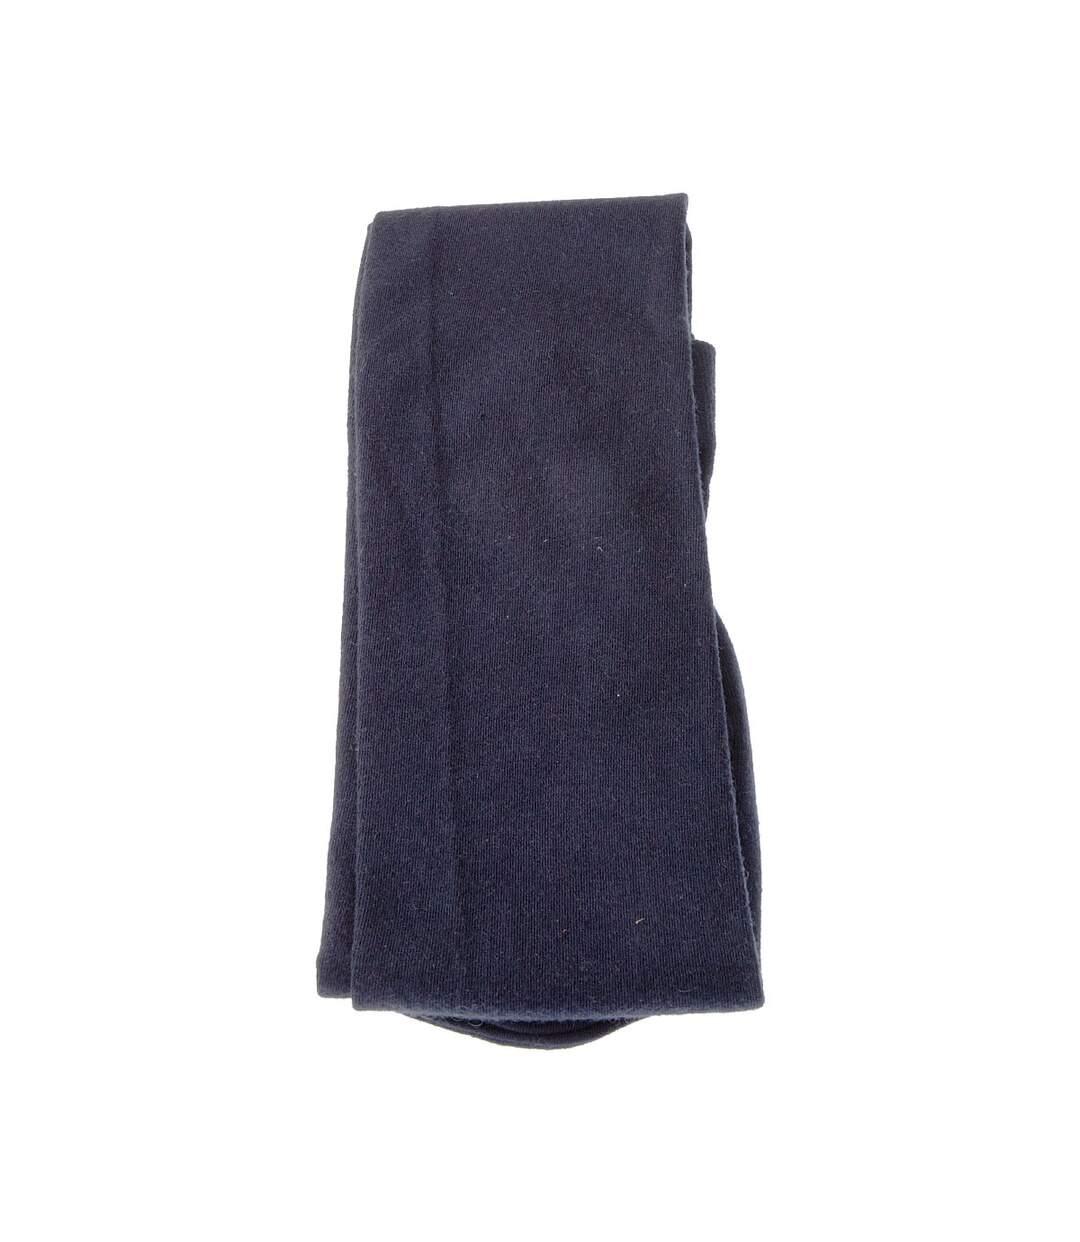 Dégagement Collant chaud 1 paire Unis maille jersey Ultra opaque Mat Gousset polyamide Viscose Bleu Prestige dsf.d455nksdKLFHG